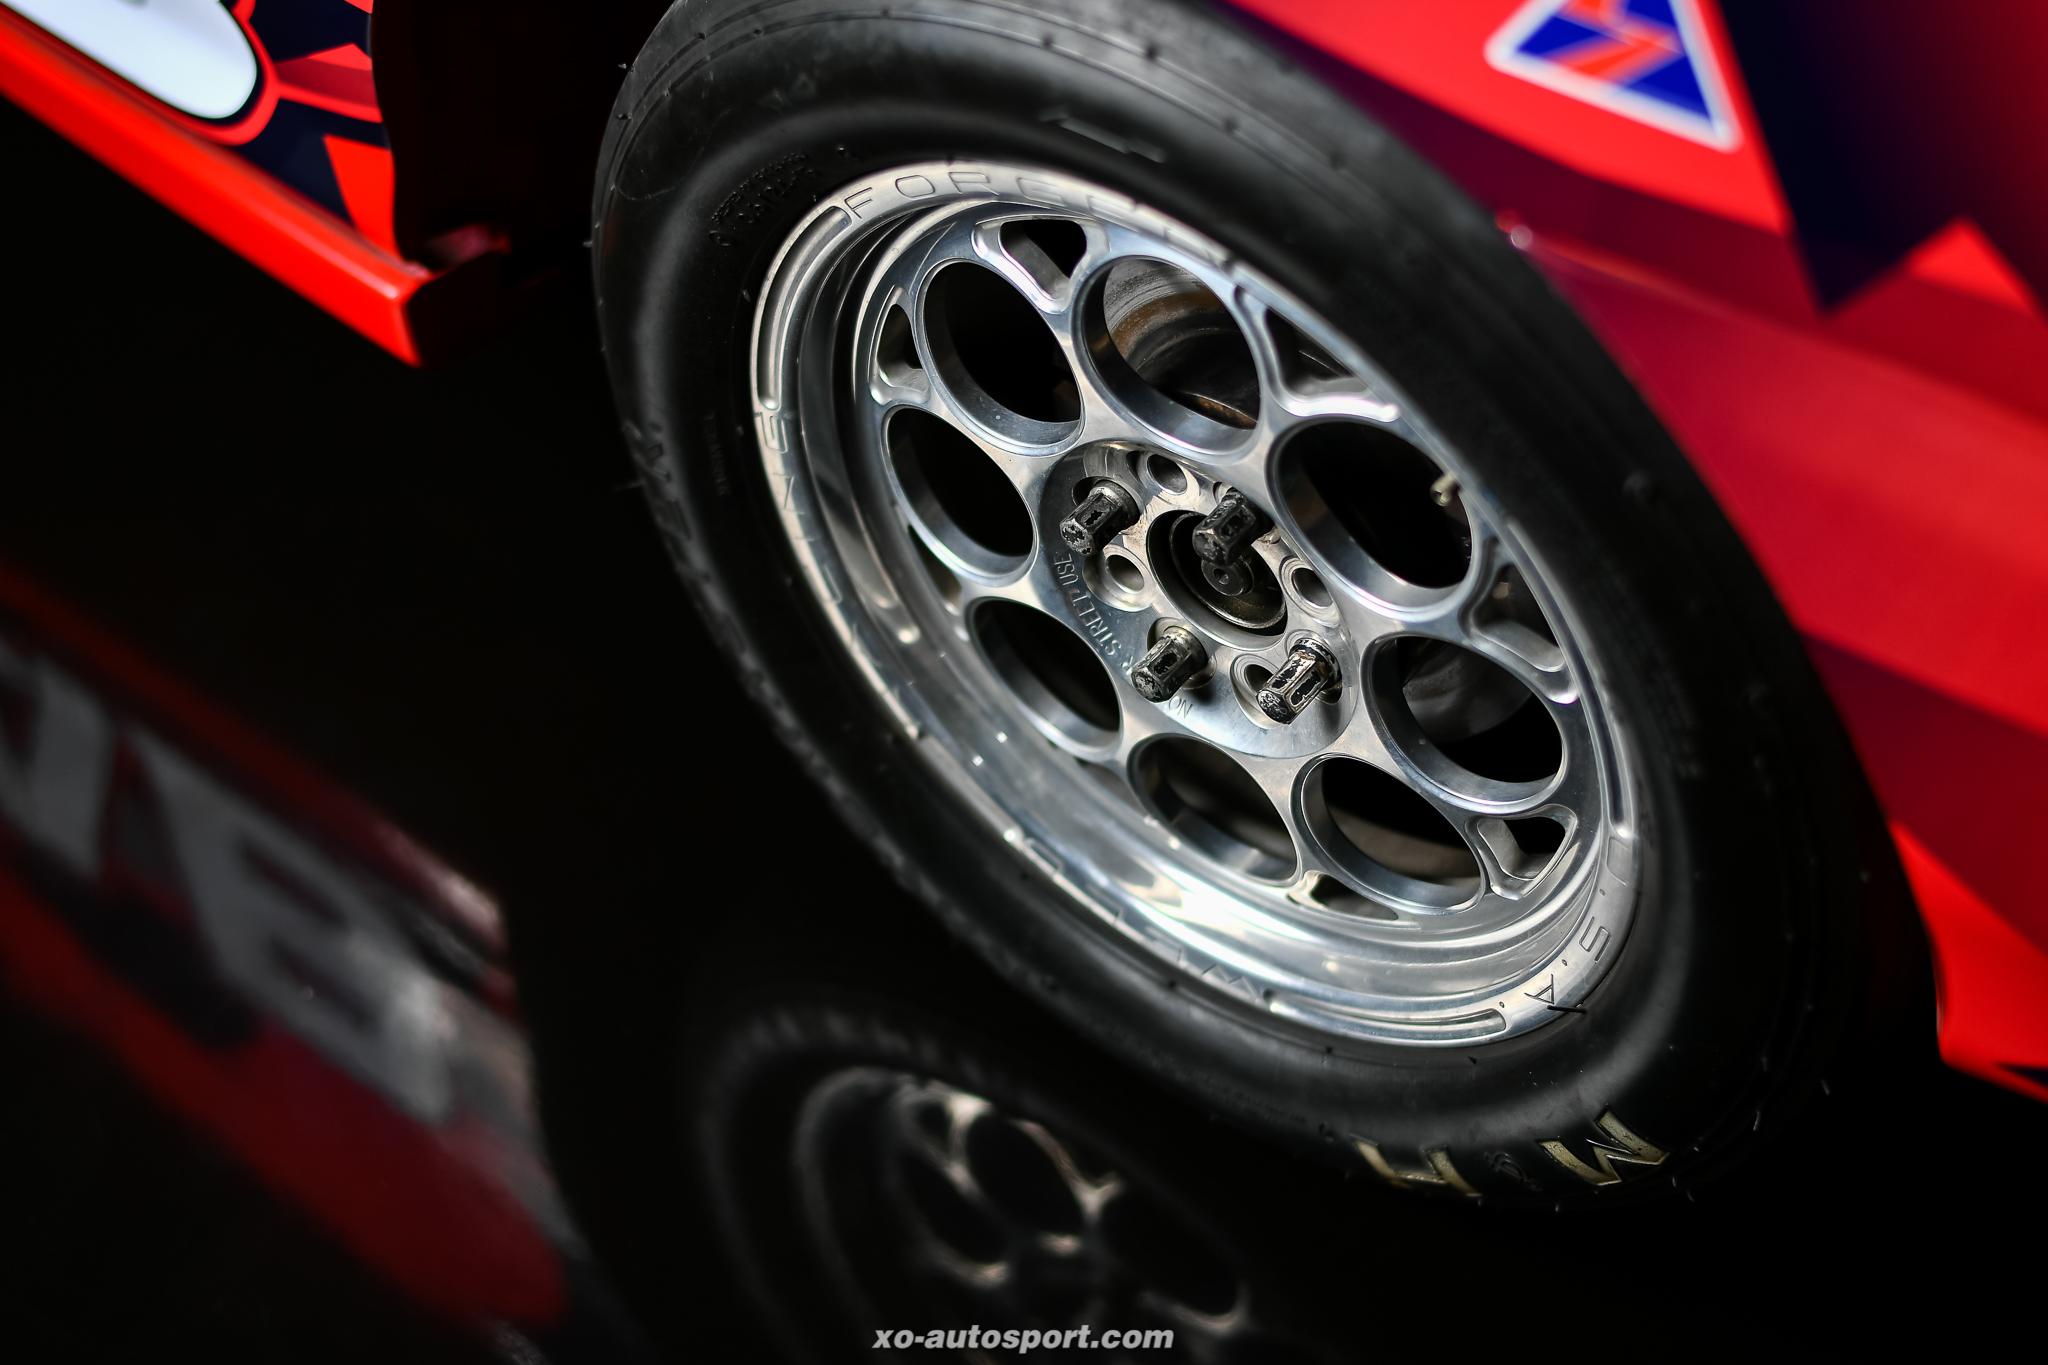 INTEGRA DC2 PRO 4 FWD Champion by FLOW LAB CNC 09